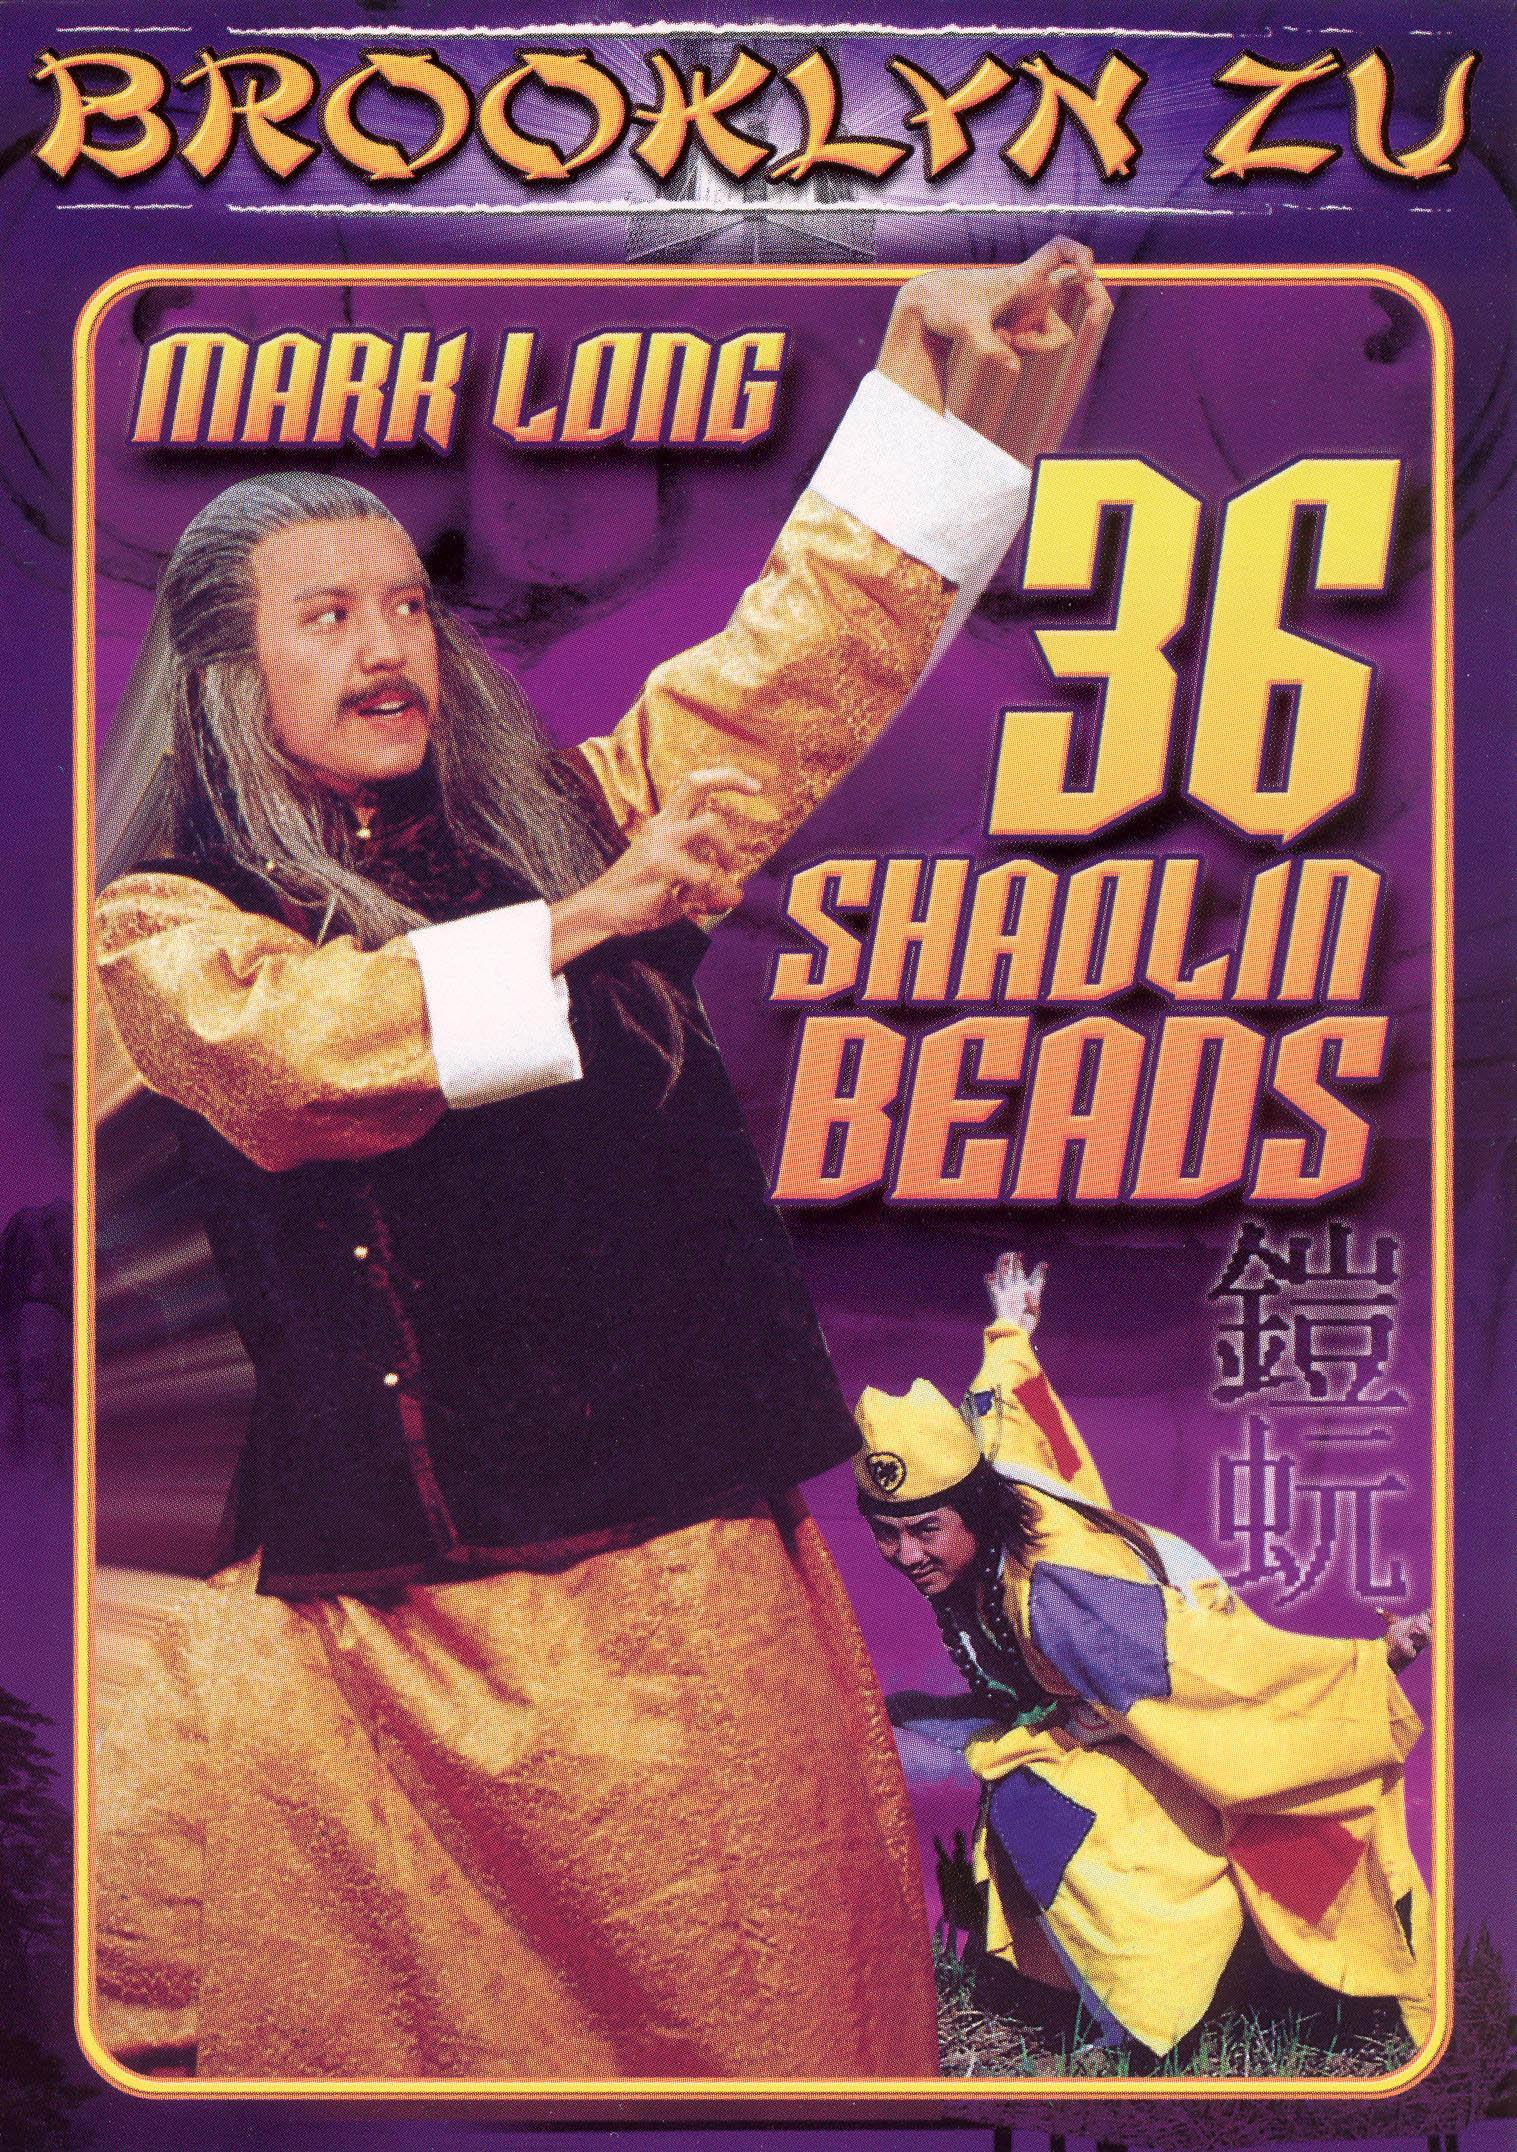 The 36 Shaolin Beads